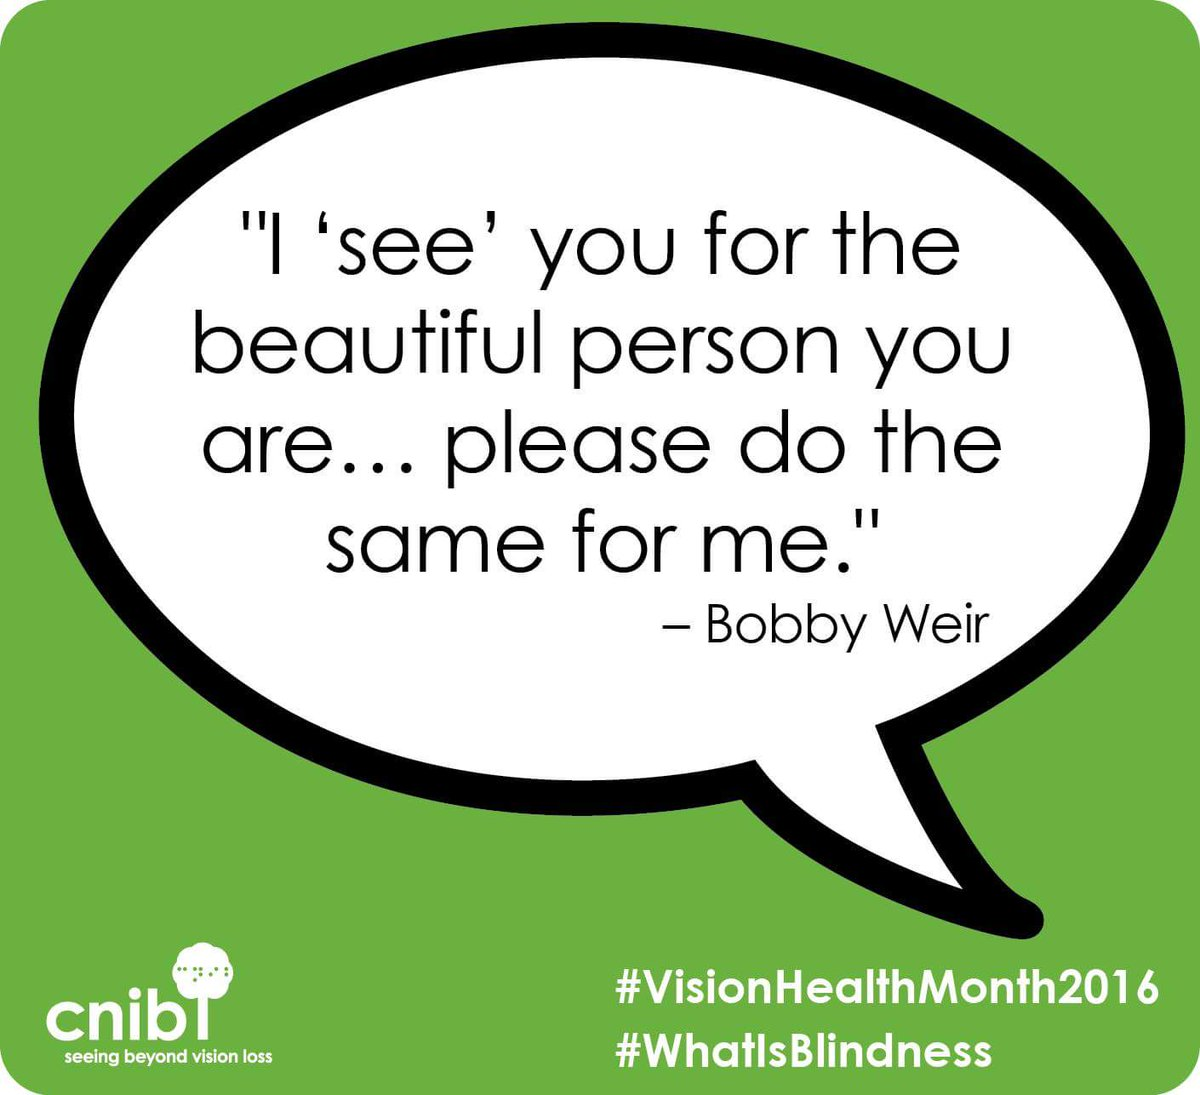 #VisionHealthMonth2016#WhatIsBlindness #CNIB https://t.co/DncGTsD5wT